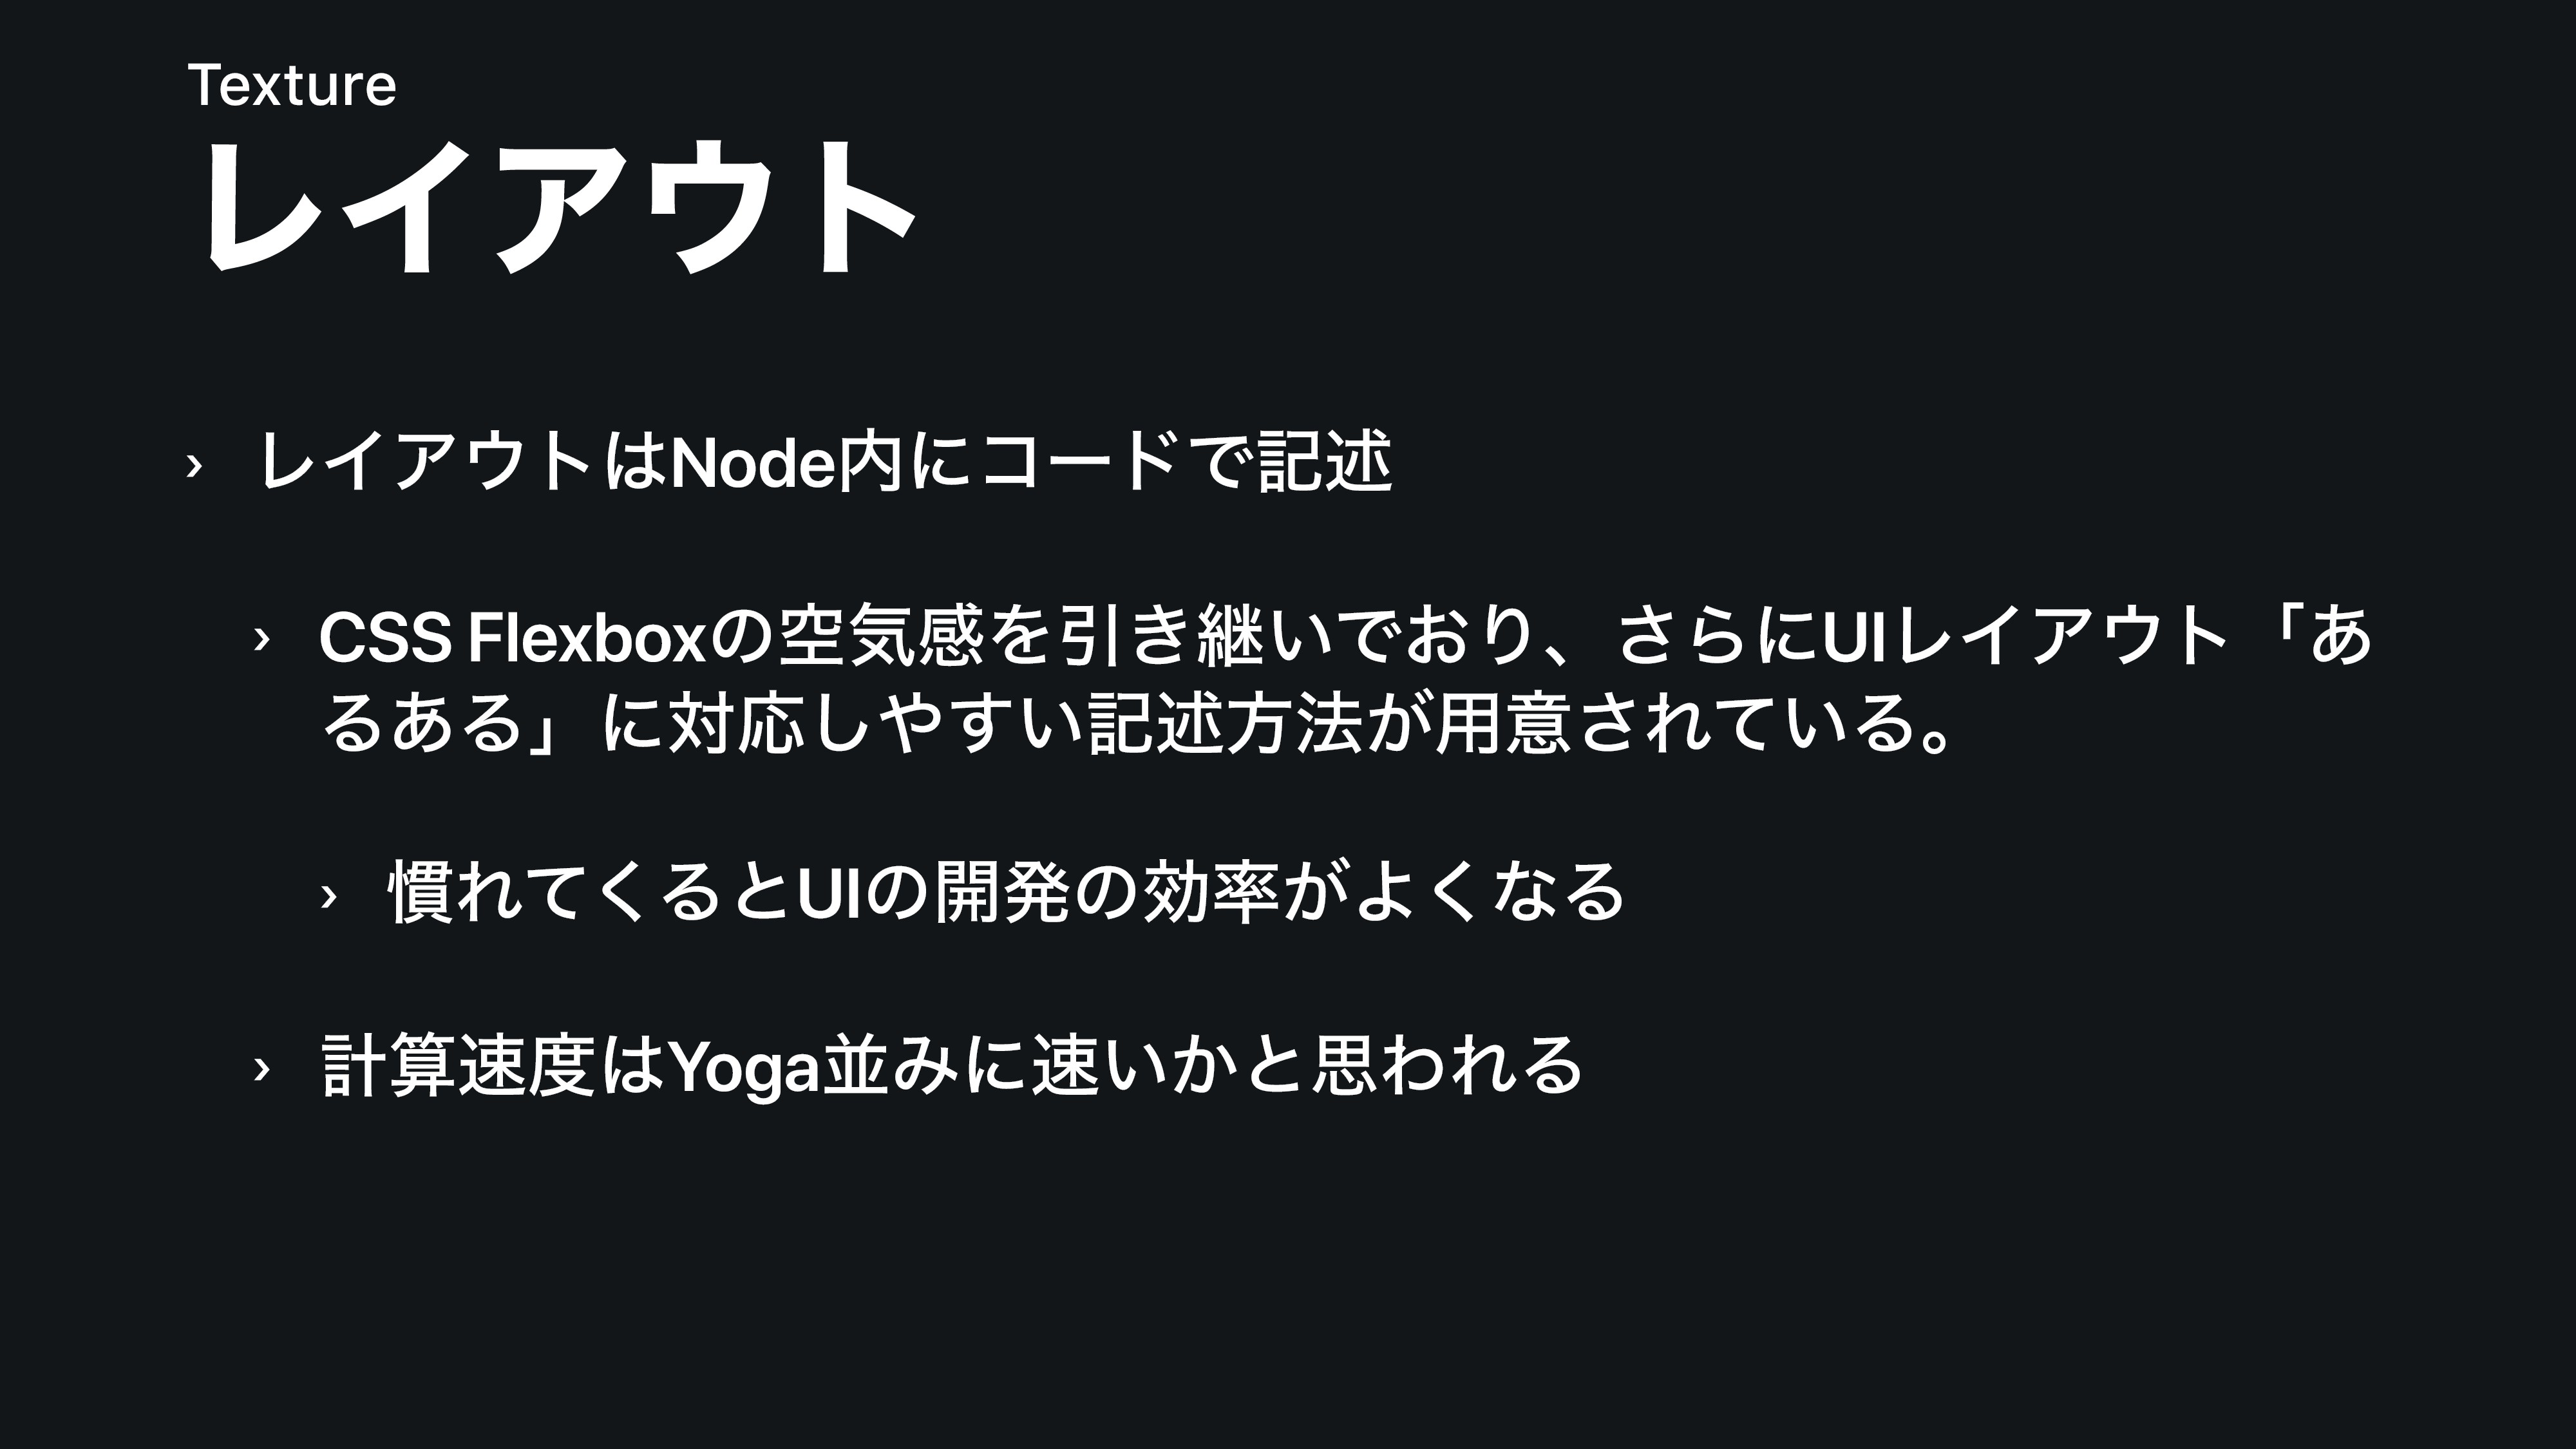 ϨΠΞτ › ϨΠΞτNodeʹίʔυͰهड़ › CSS FlexboxͷۭؾײΛҾ͖...